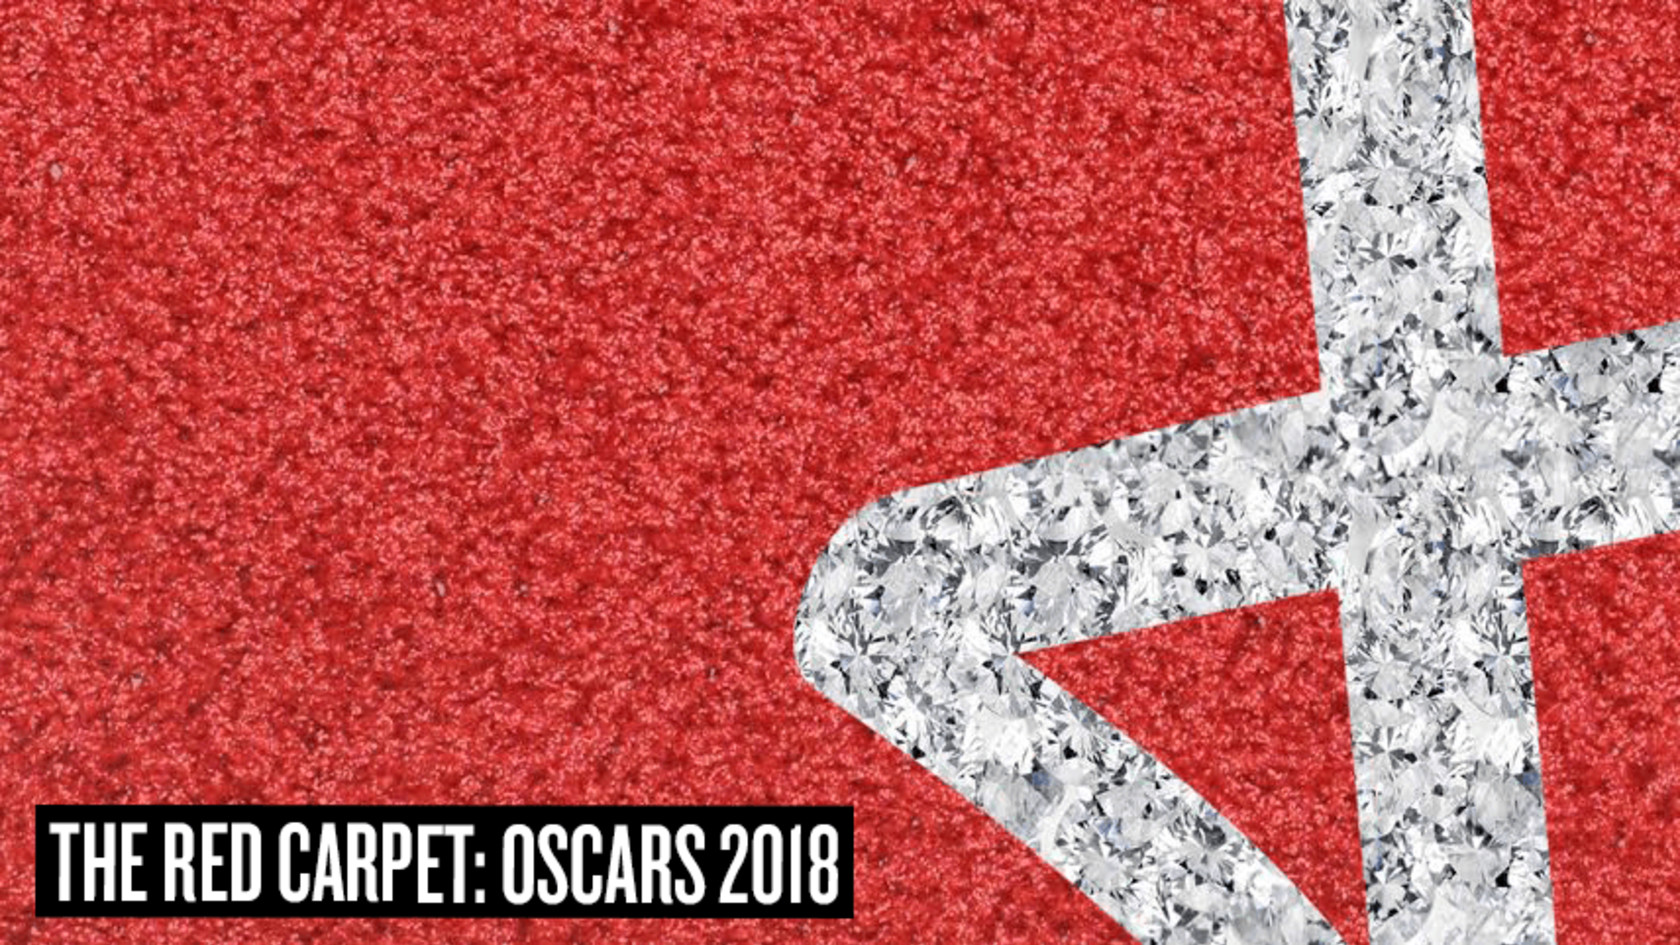 Red carpet 16 9 oscars